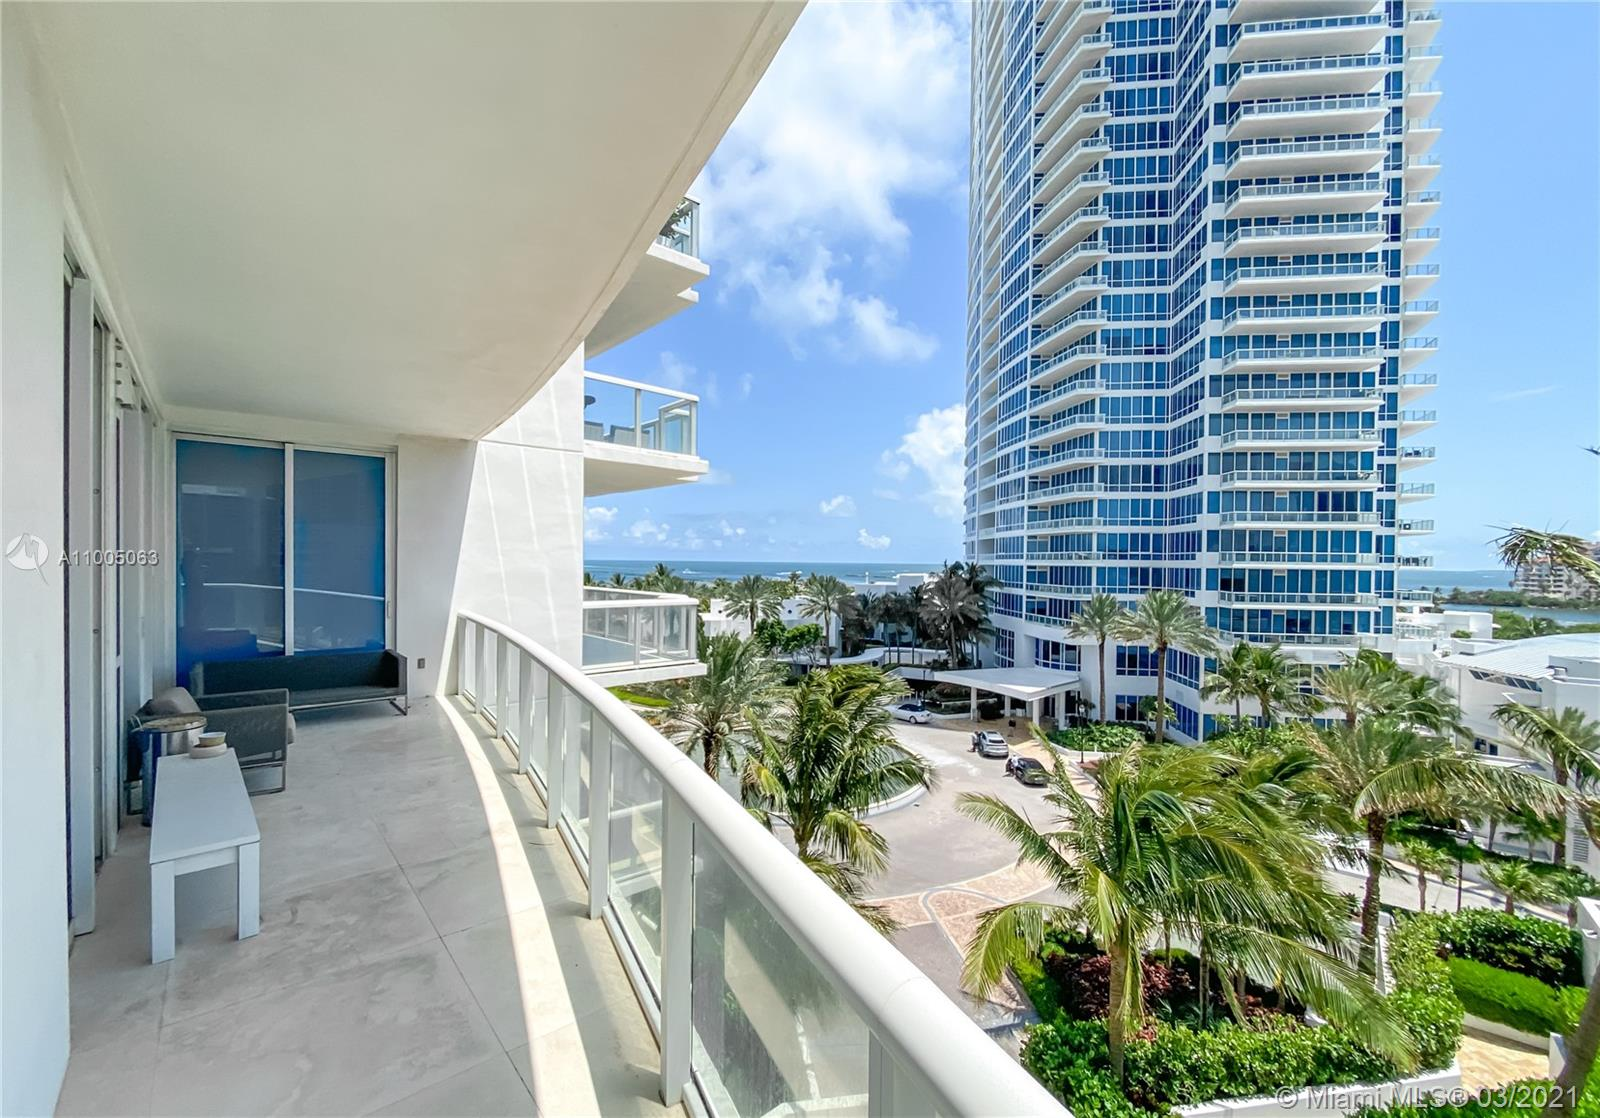 Continuum North #804 - 50 S Pointe Dr #804, Miami Beach, FL 33139